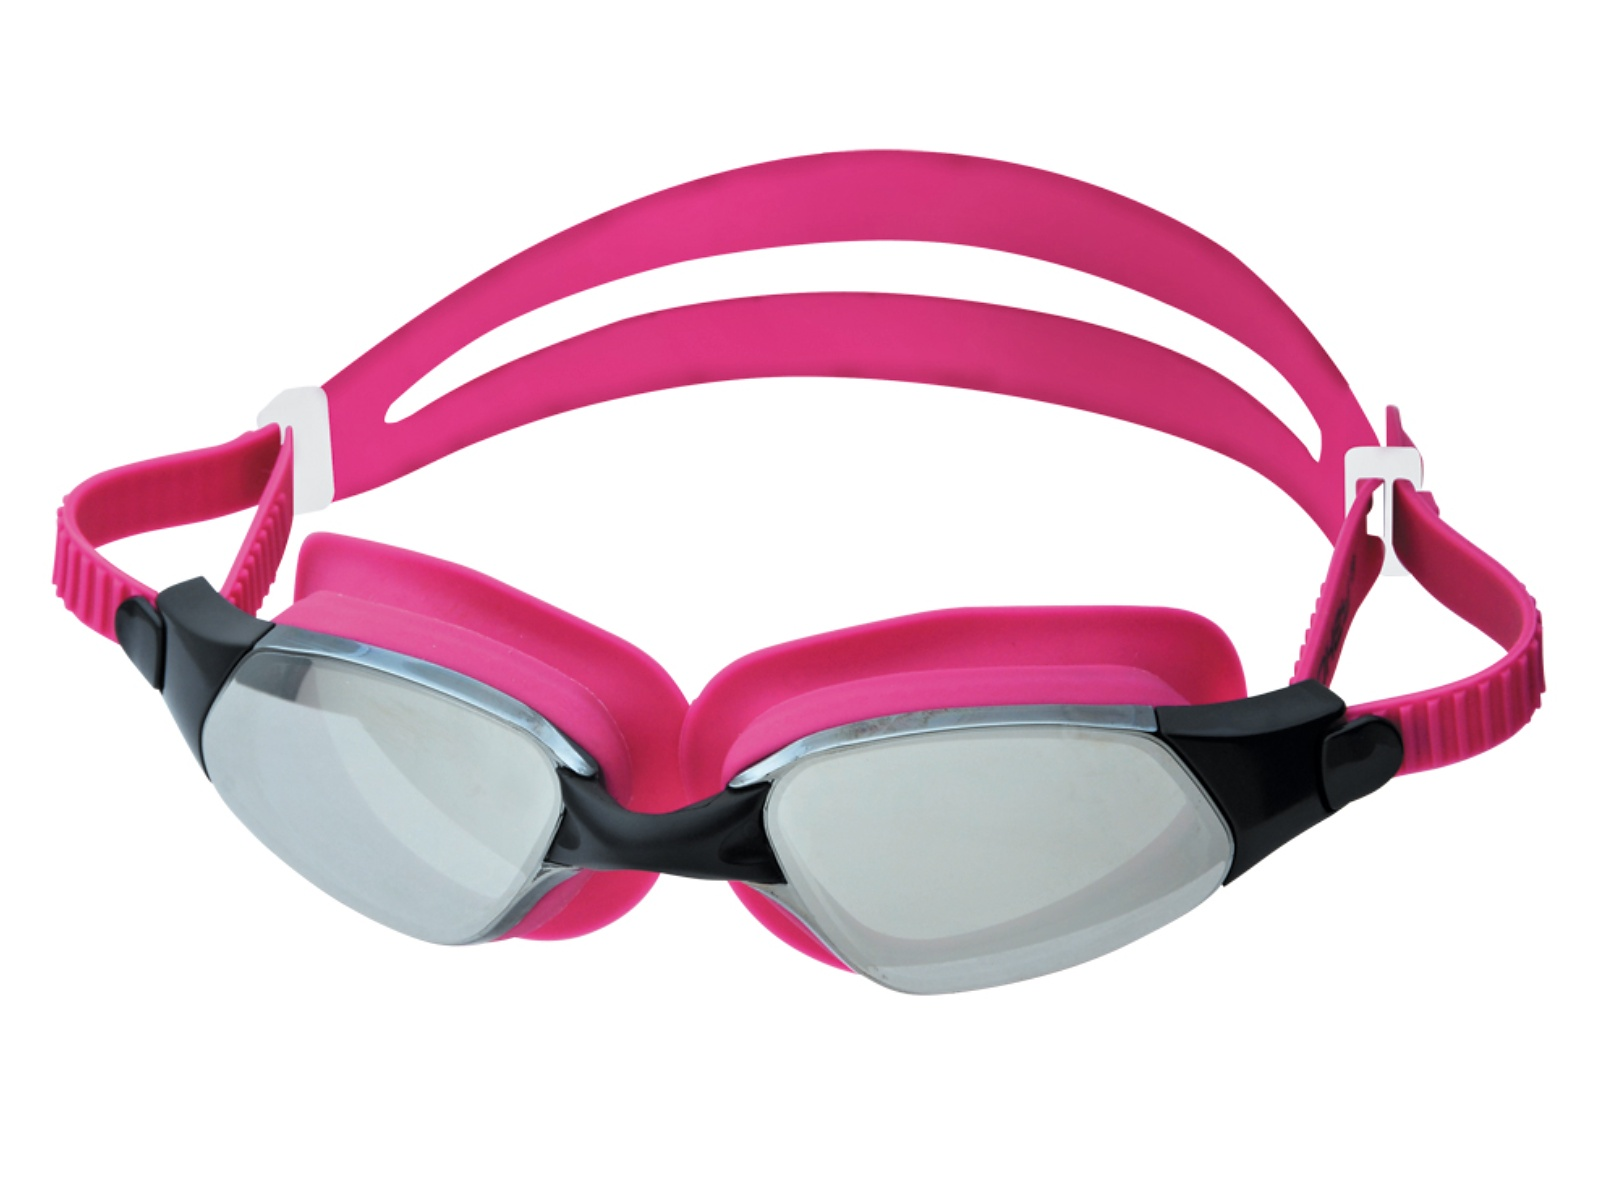 Plavecké brýle SPOKEY Dezet - růžové